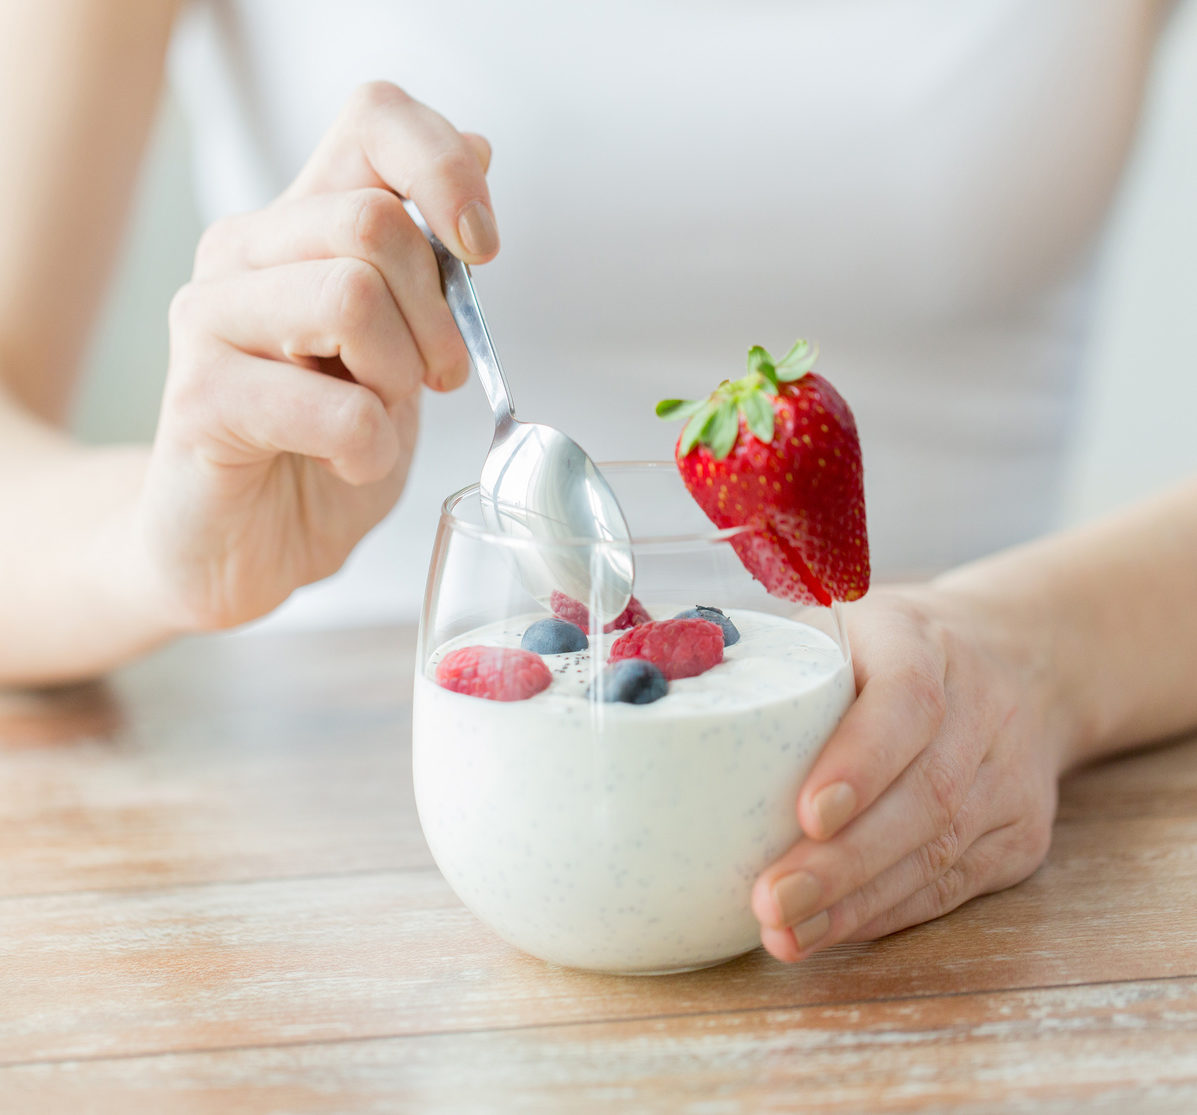 probiotic foods | RSC Bay Area | bowl of probiotic yogurt and fruit